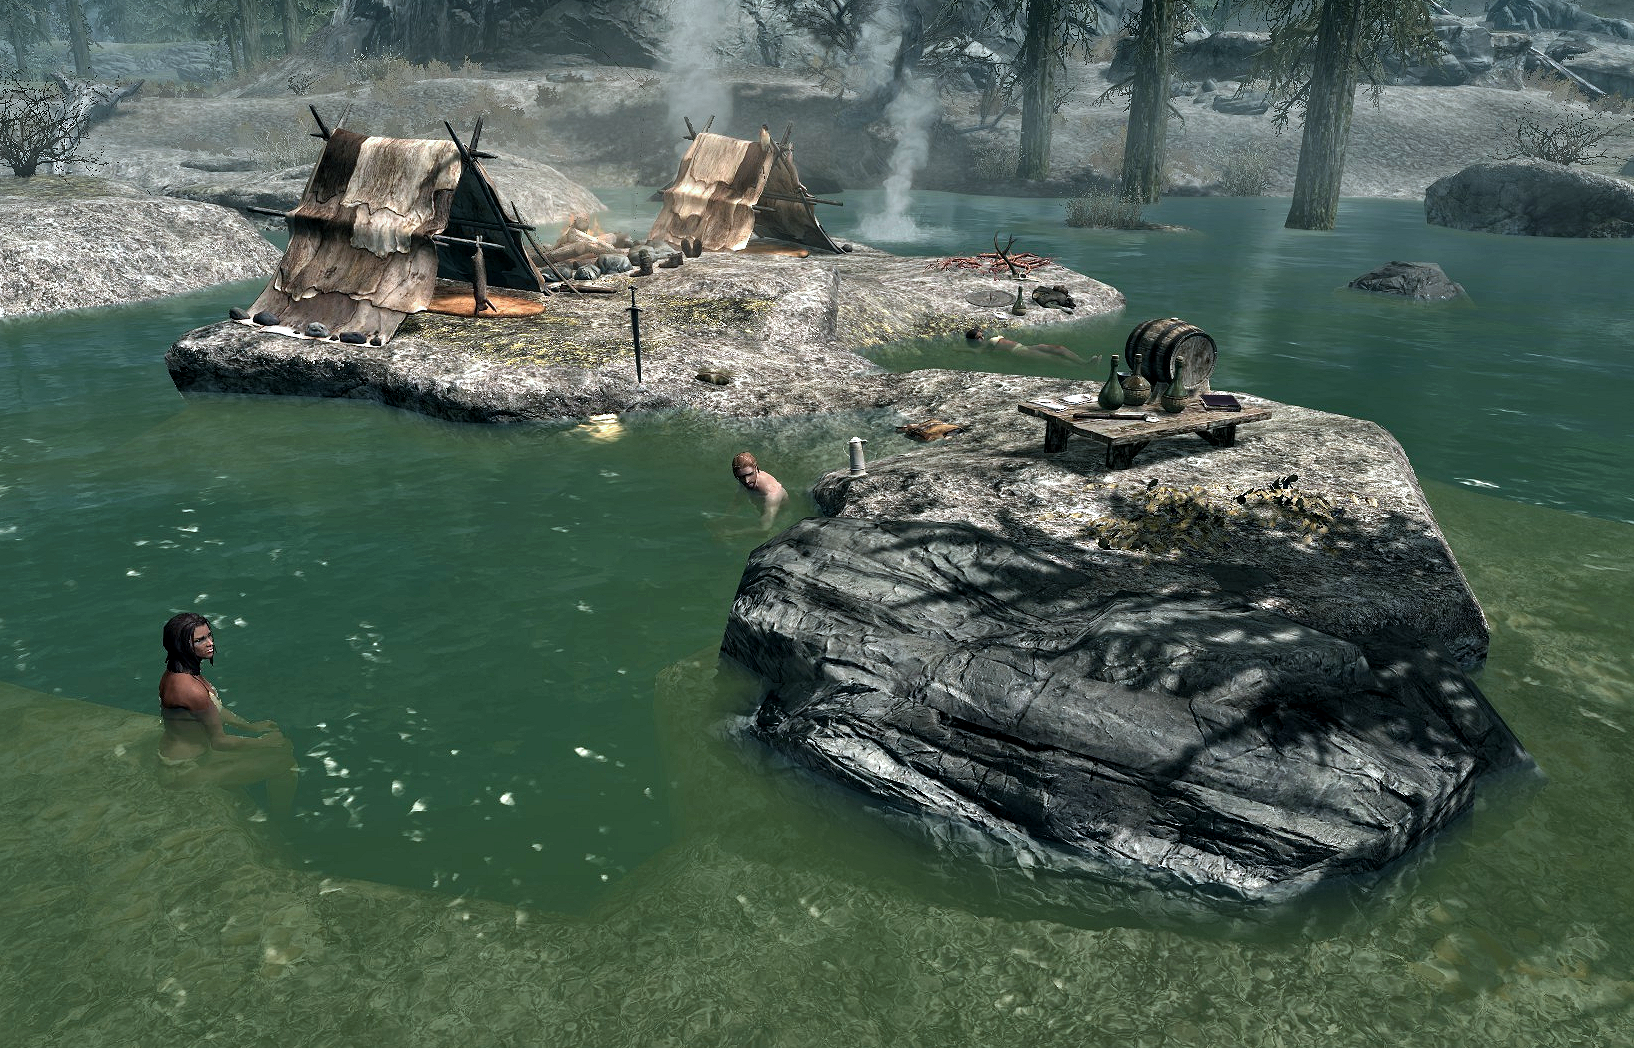 Hunter Jacuzzi Camp | Elder Scrolls | FANDOM powered by Wikia